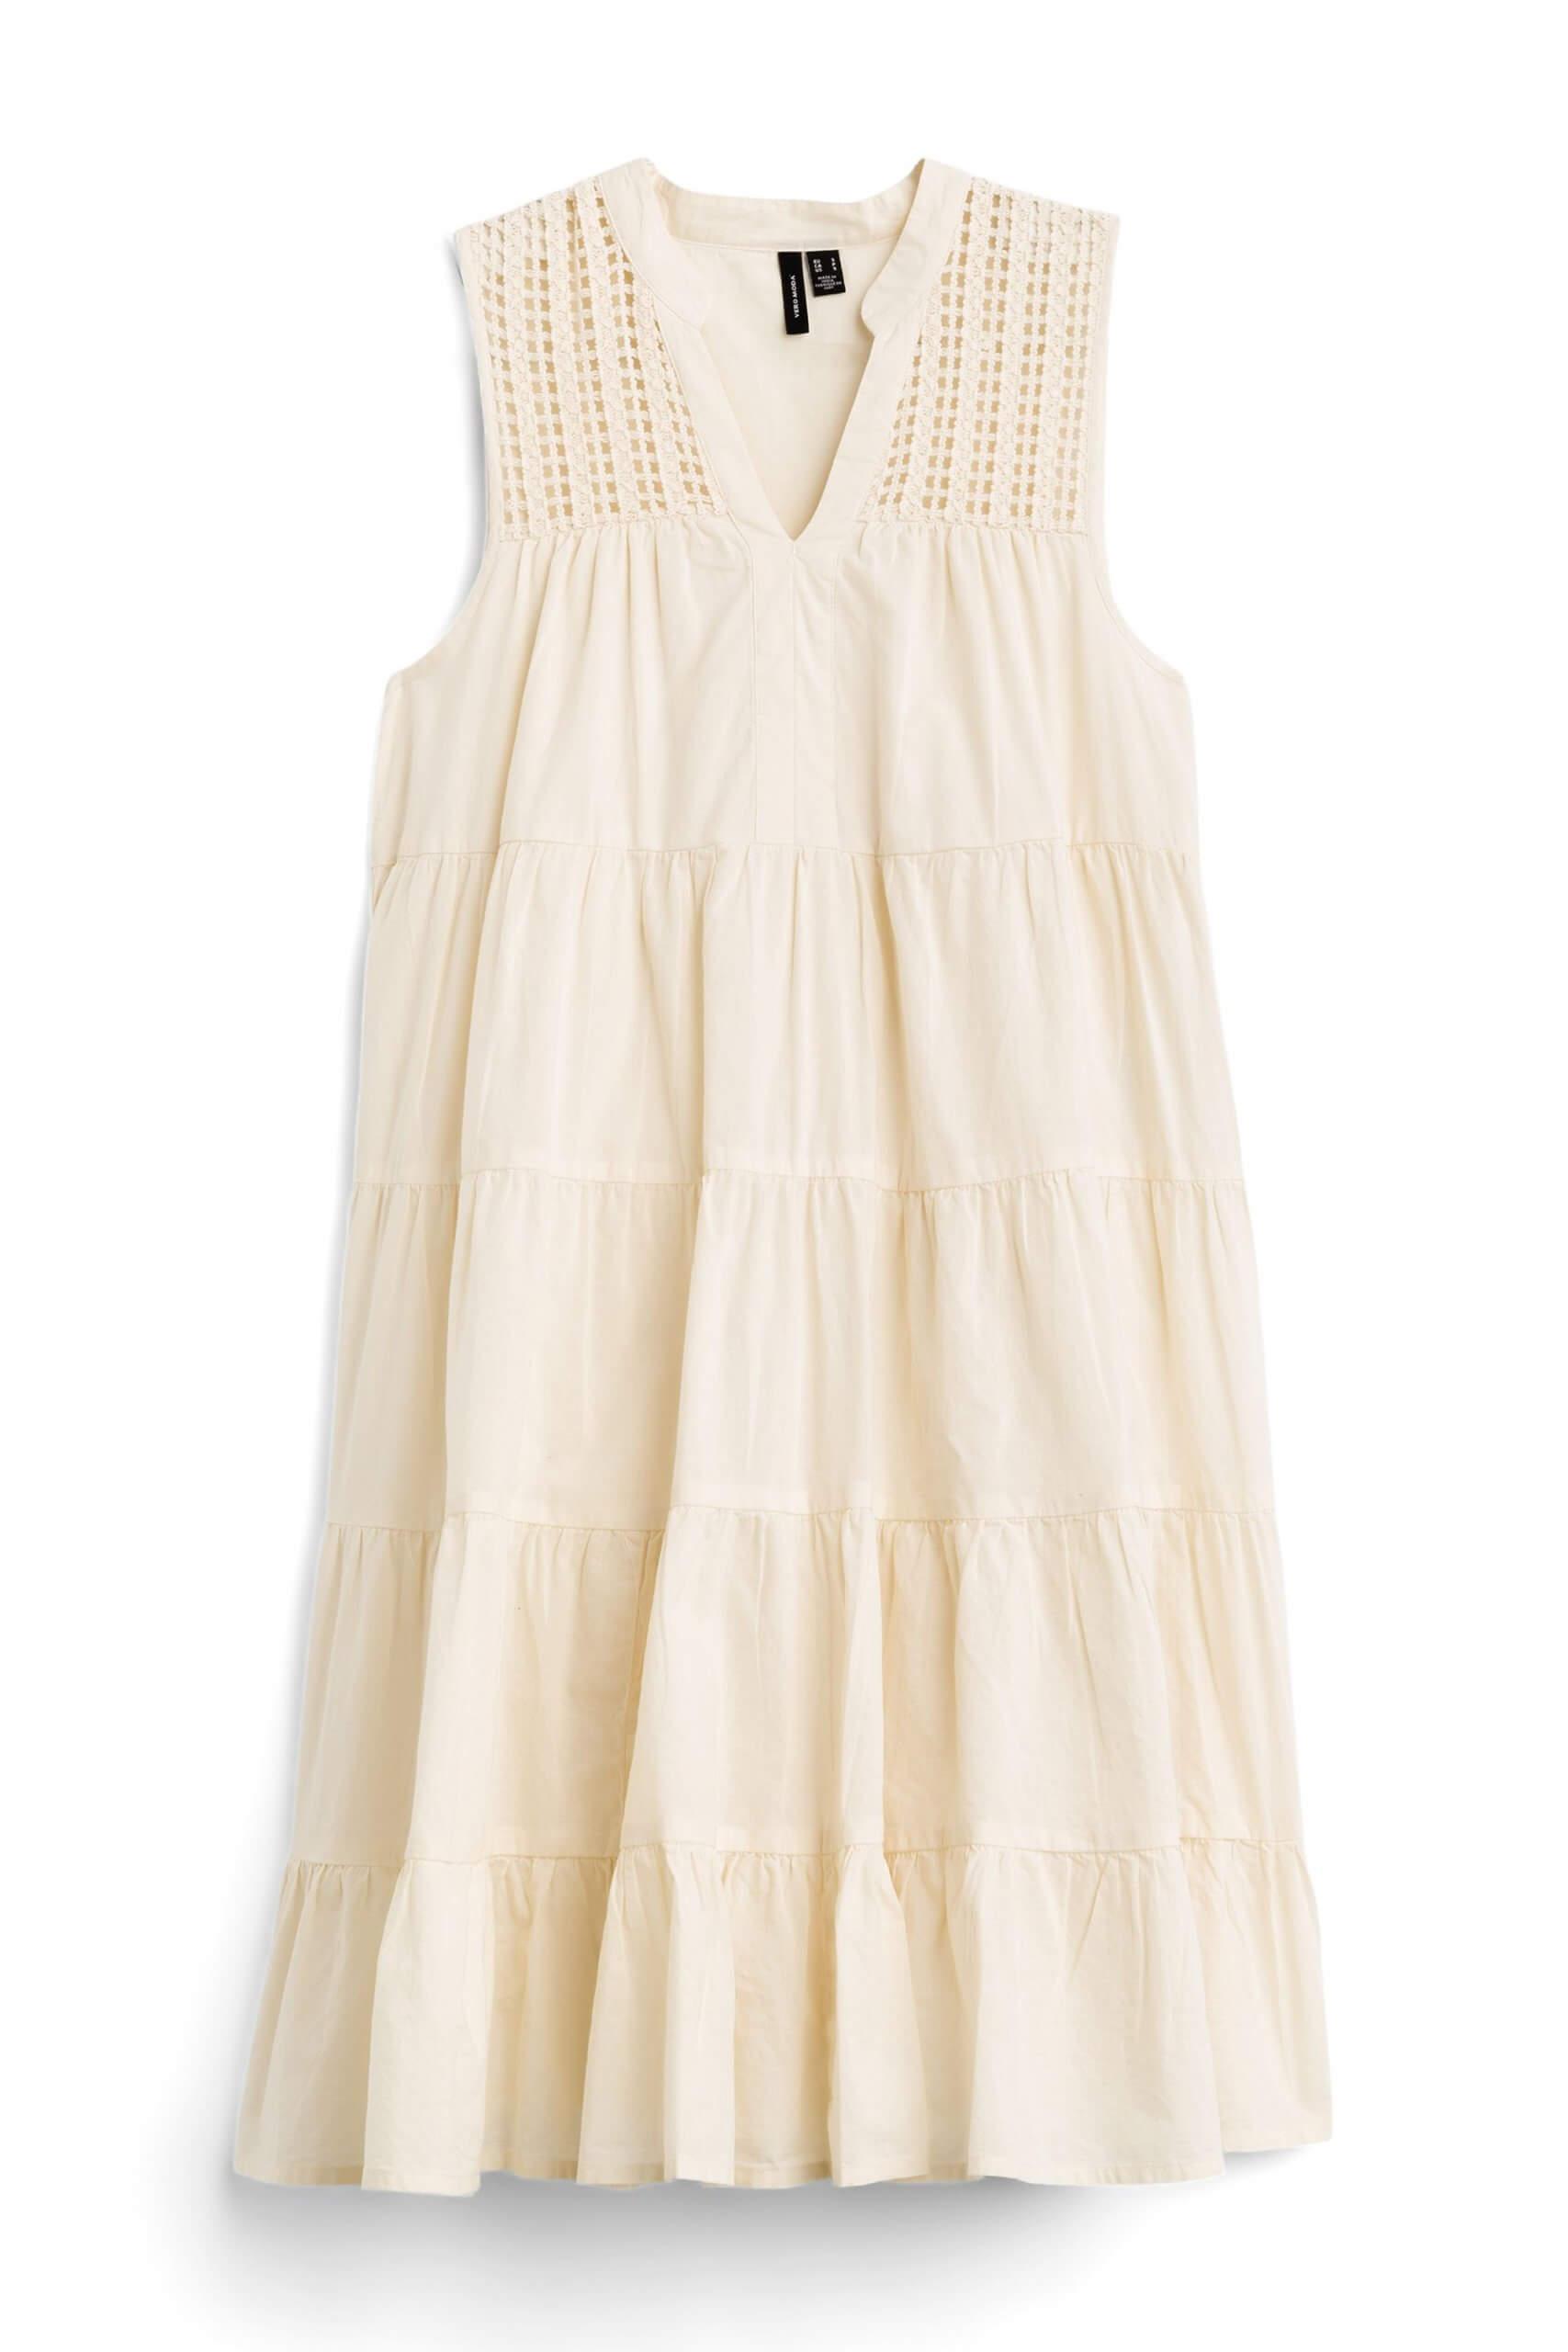 Stitch Fix Women's cream shift dress.